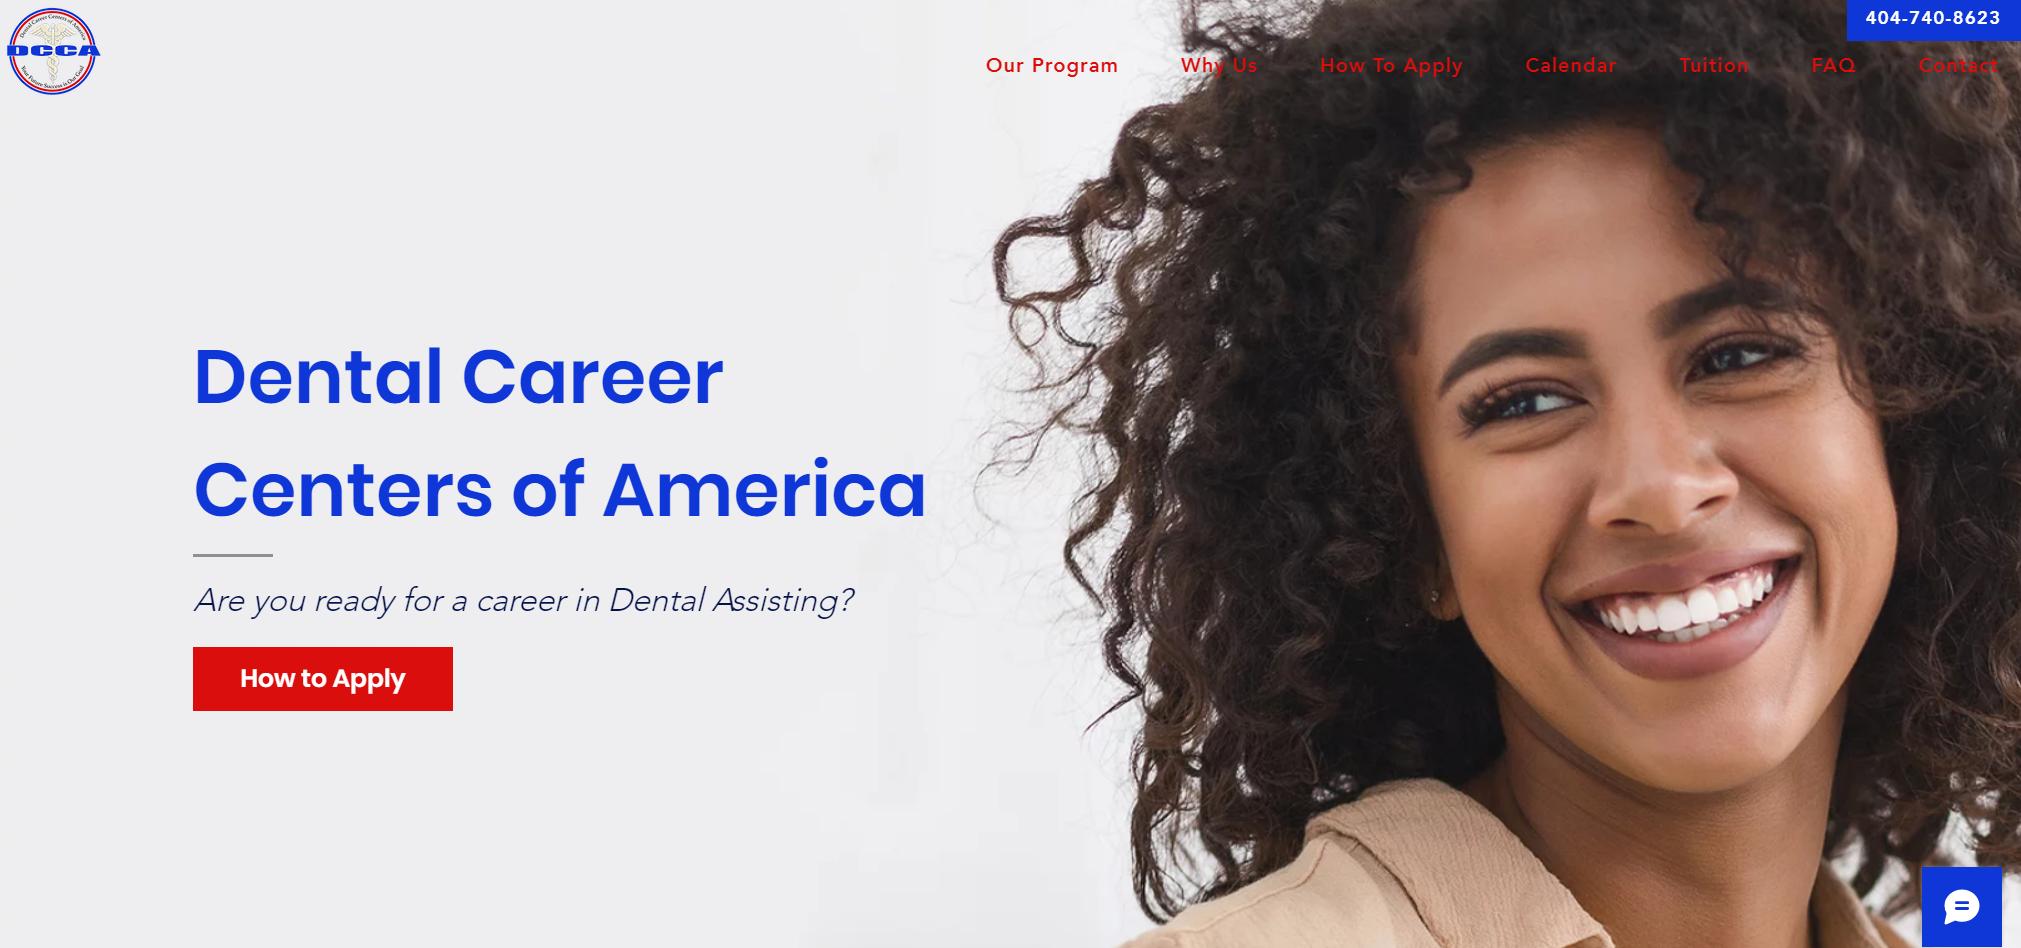 Dental Career Centers of America